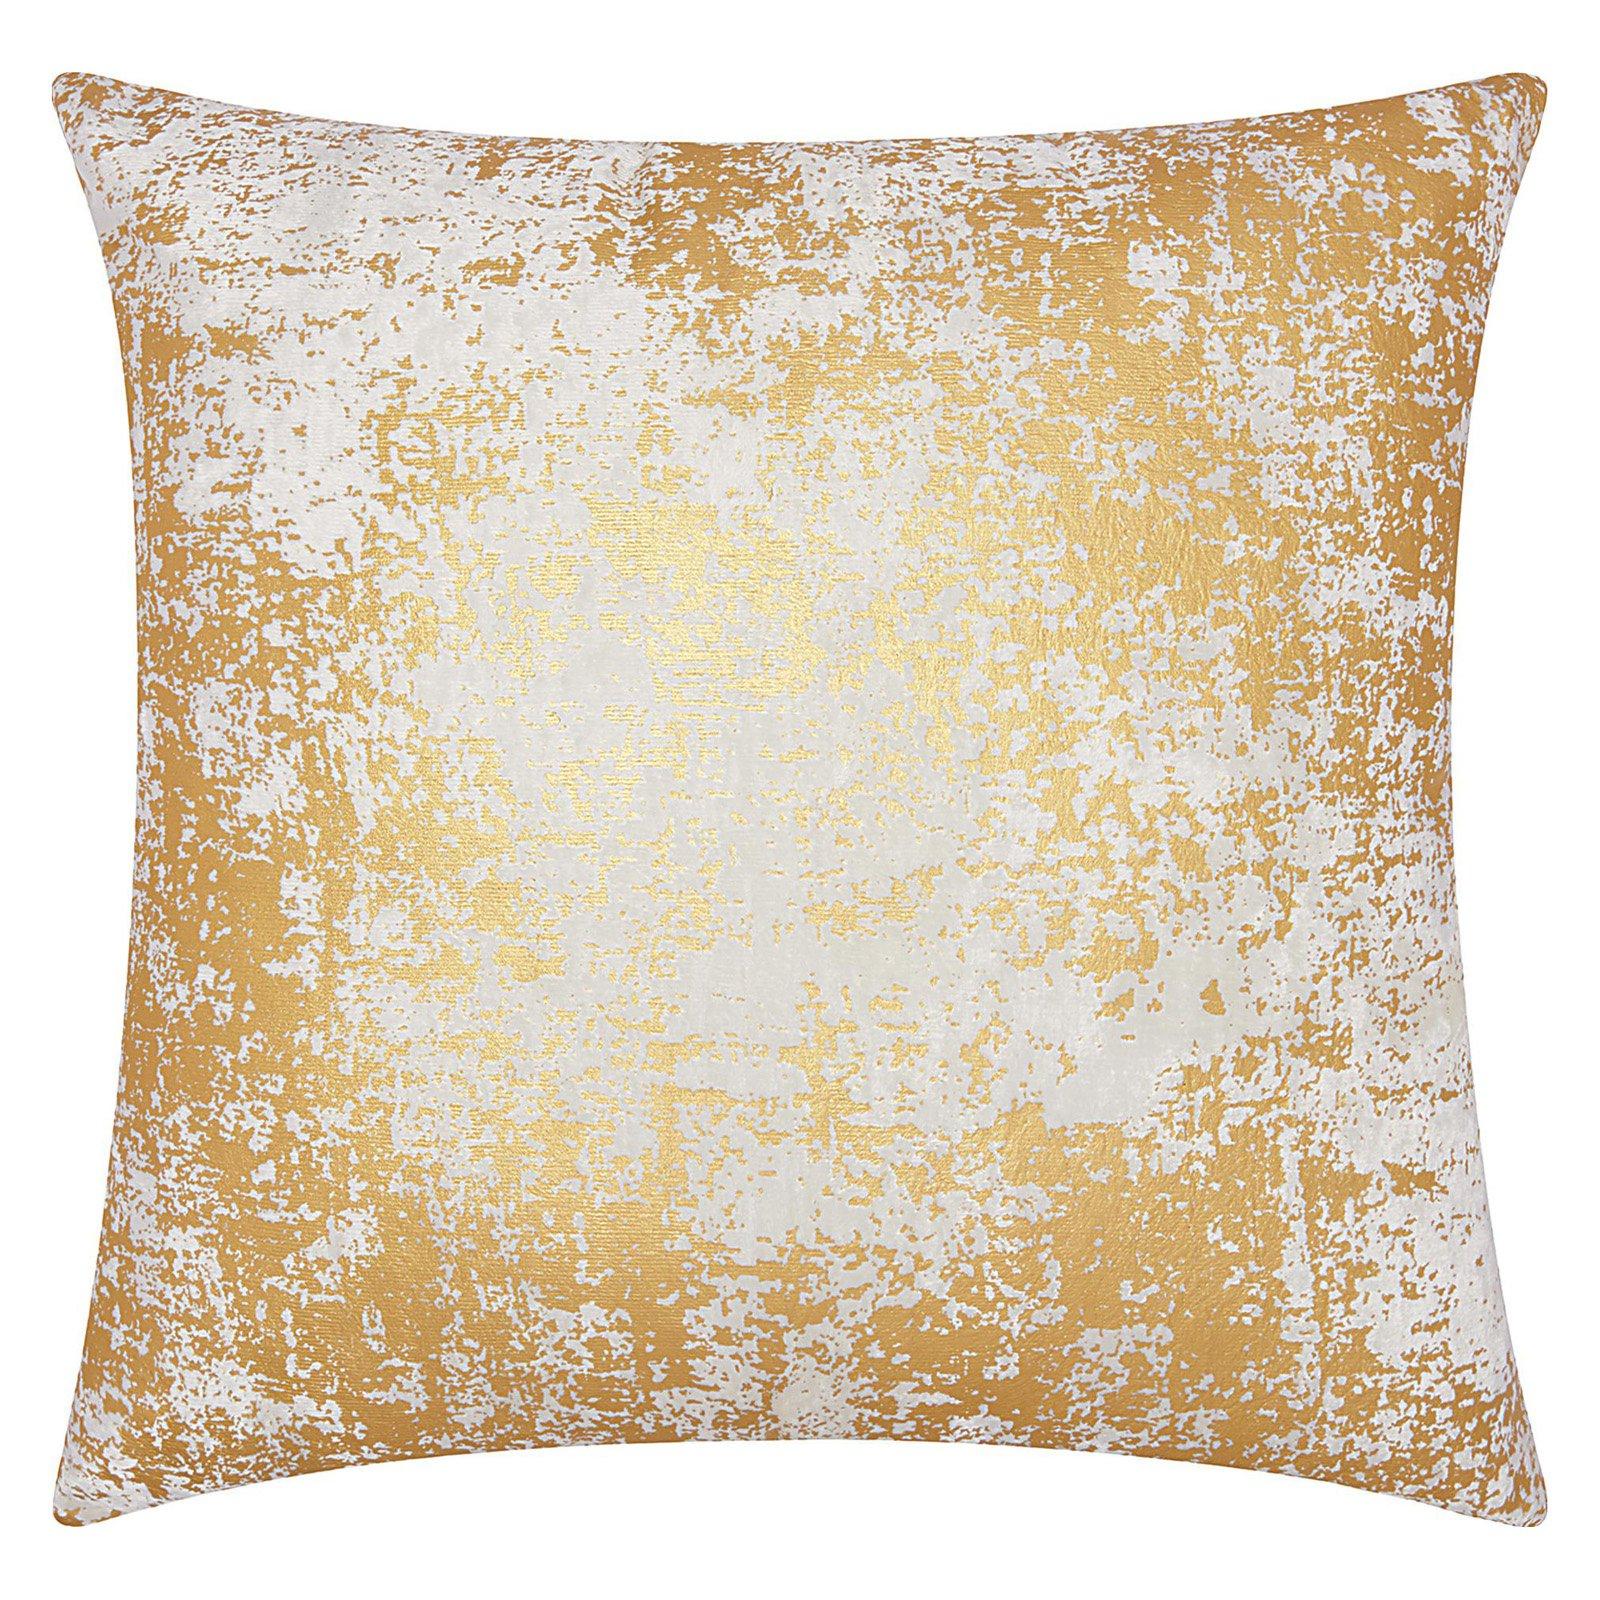 "Nourison Luminecence Distressed Metallic Decorative Throw Pillow, 20"" x 20"", Gold"